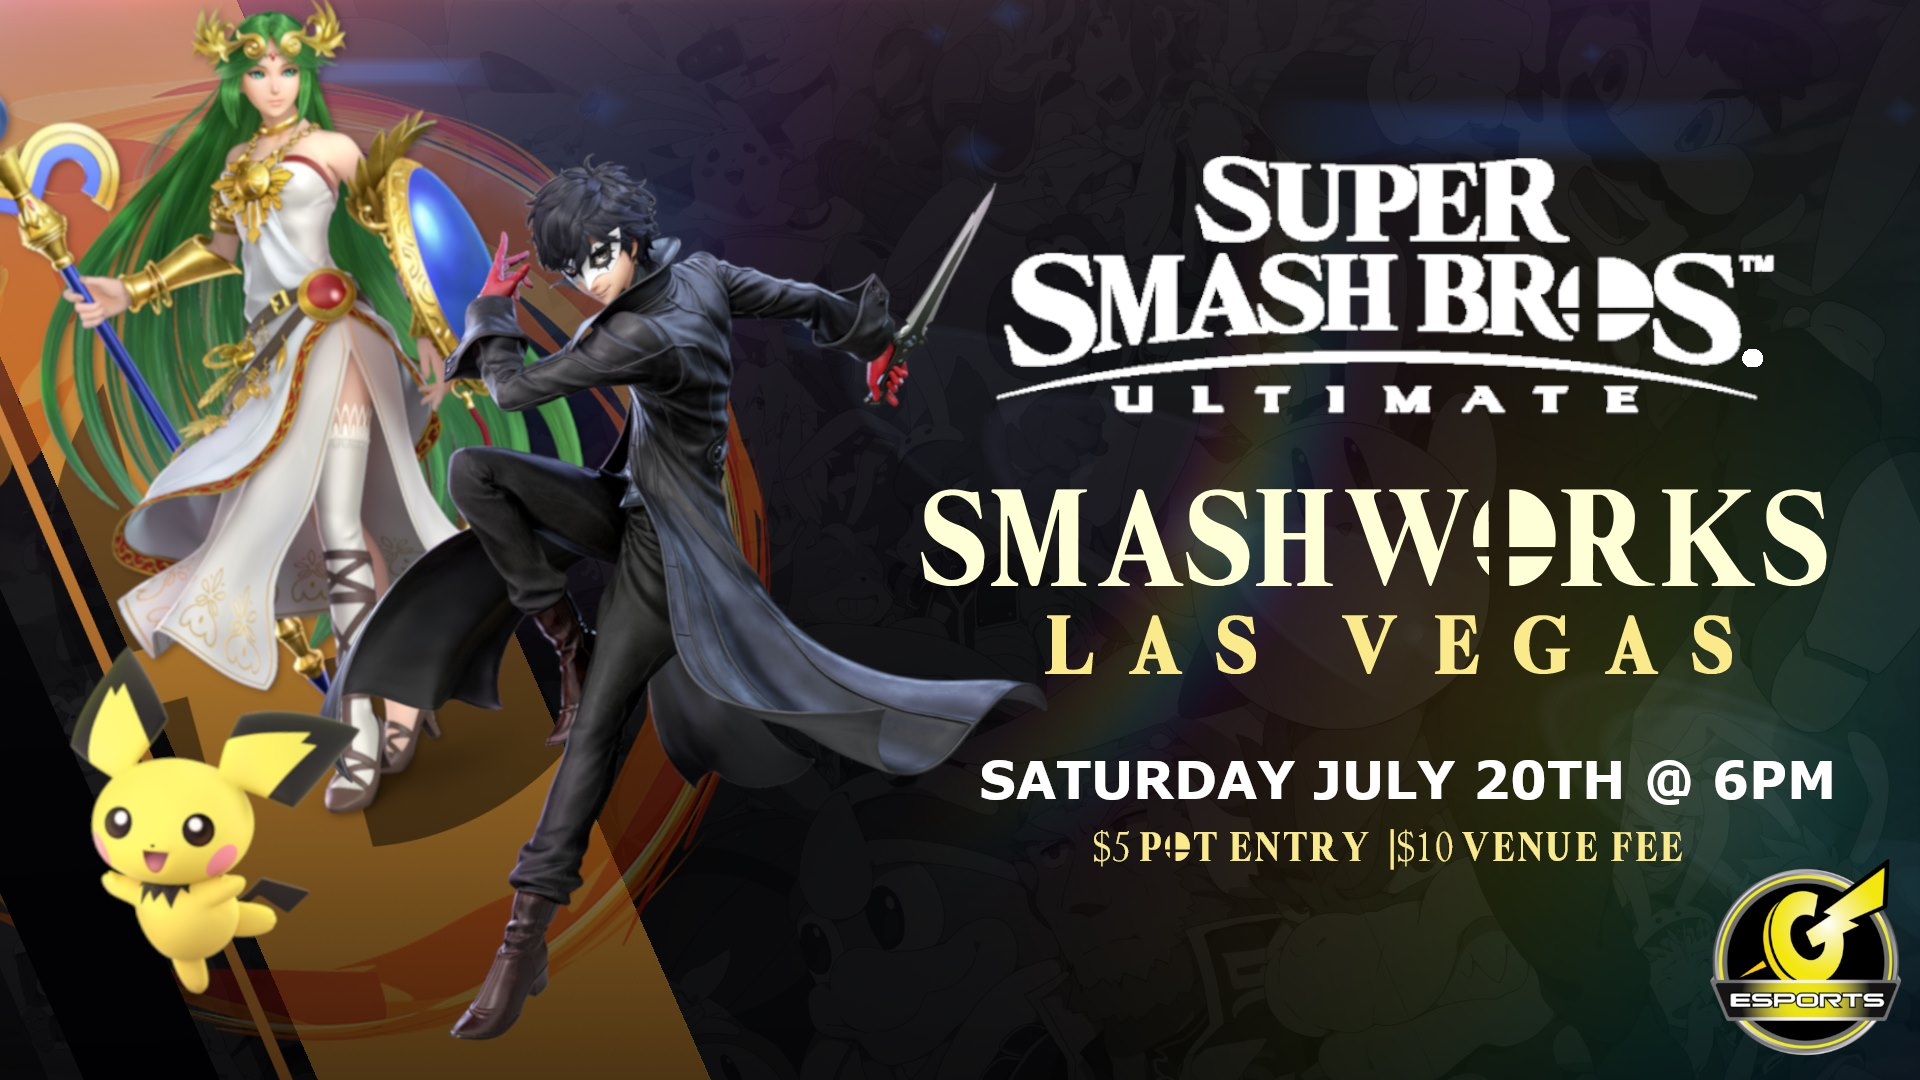 SmashWorks - A Super Smash Bros Ultimate Monthly Tournament